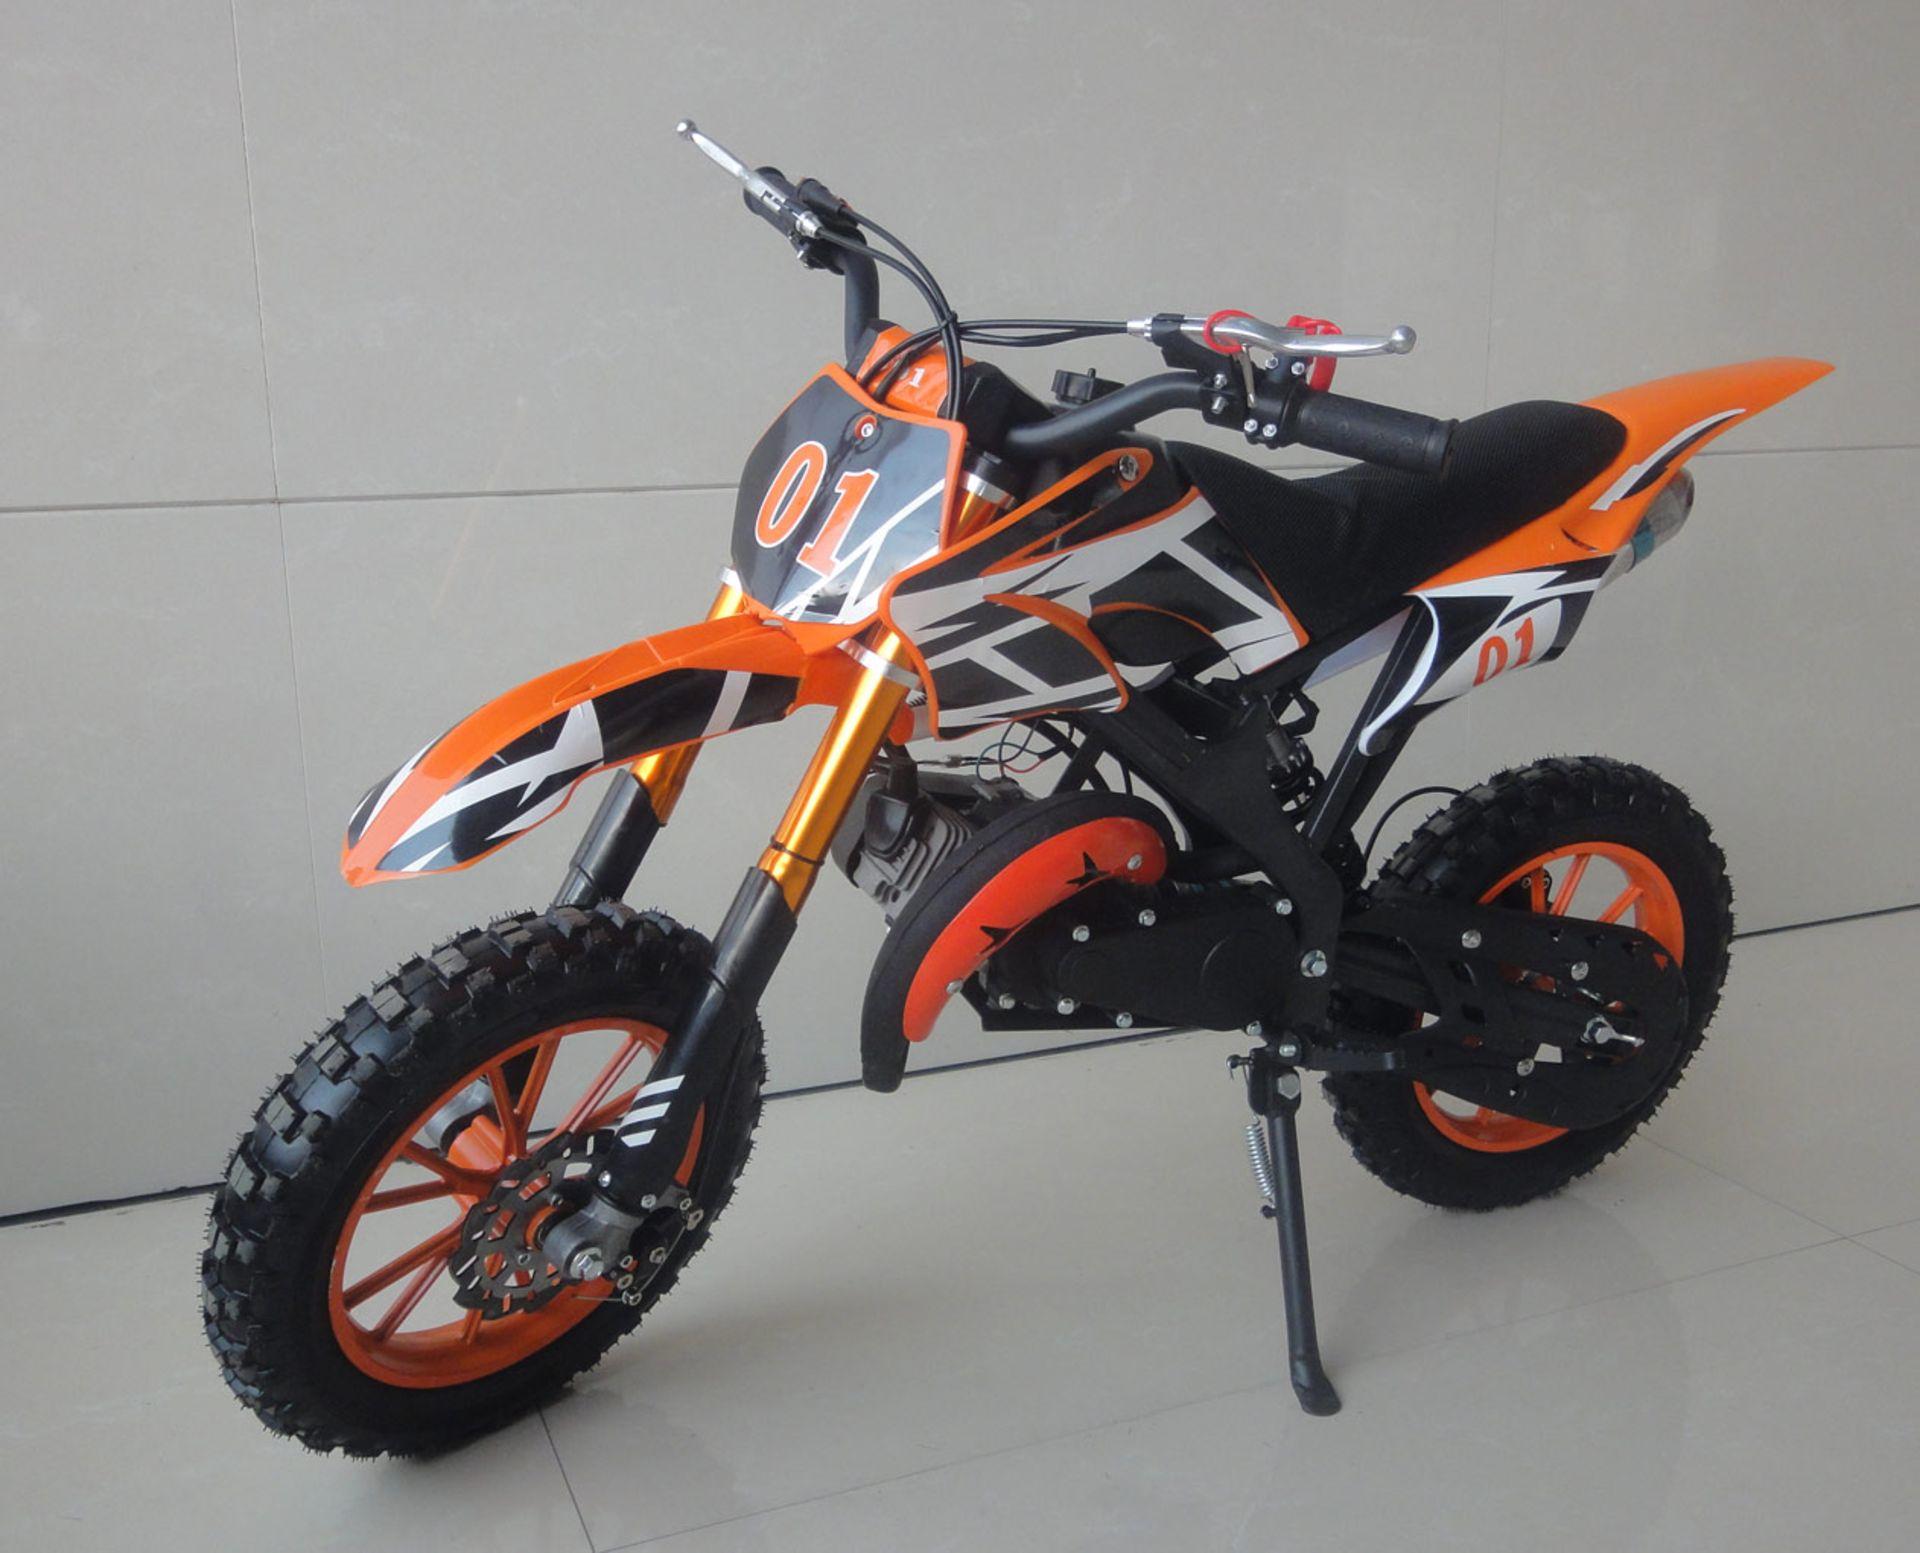 + VAT Brand New 49cc Falcon Mini Dirt Bike - Full Front & Rear Suspension - Disc Brakes - Easy Pull - Image 5 of 6